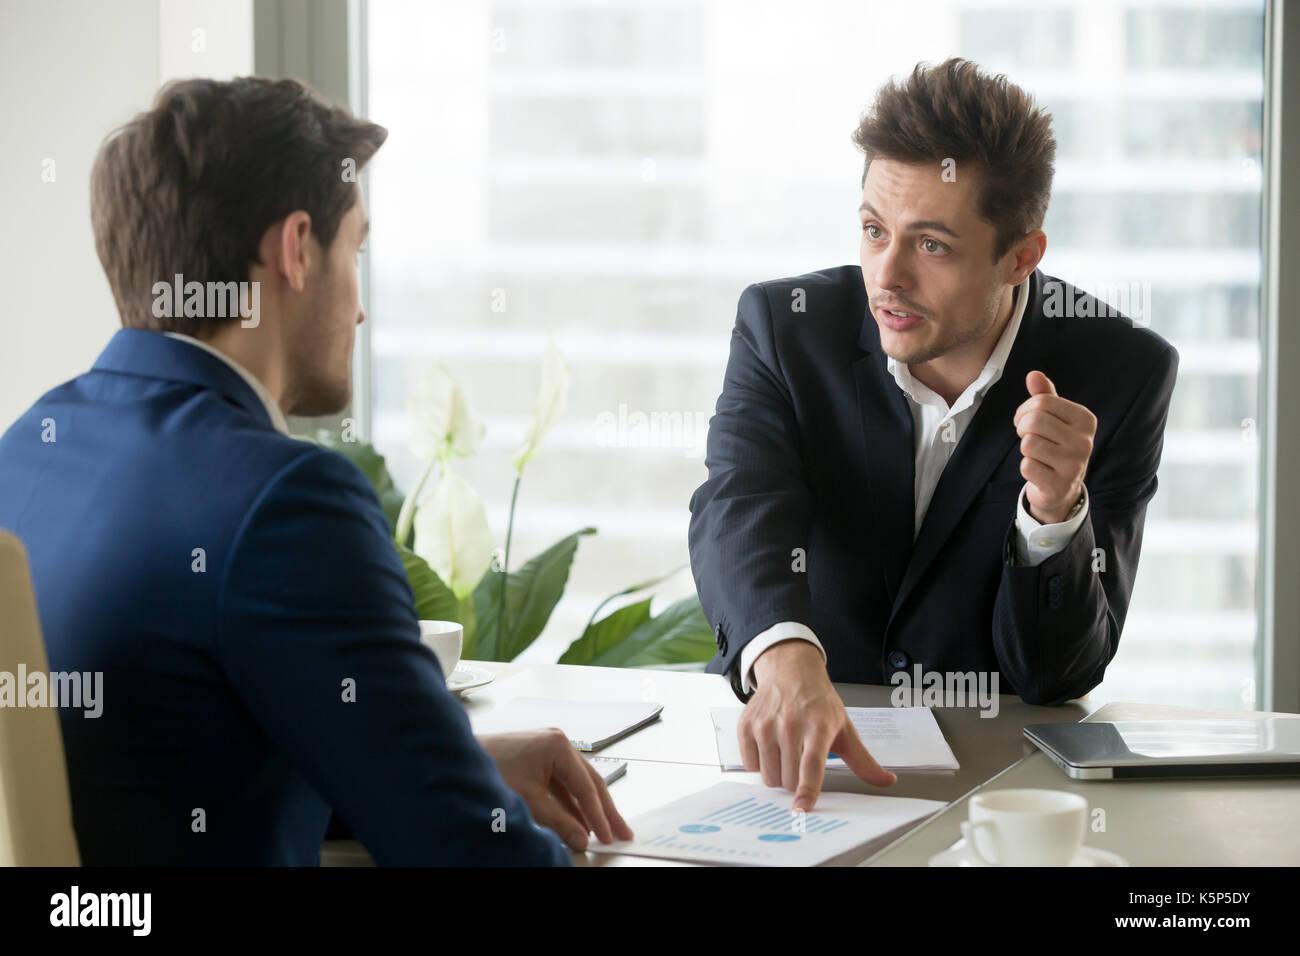 Entrepreneurs discussing business plan on meeting - Stock Image